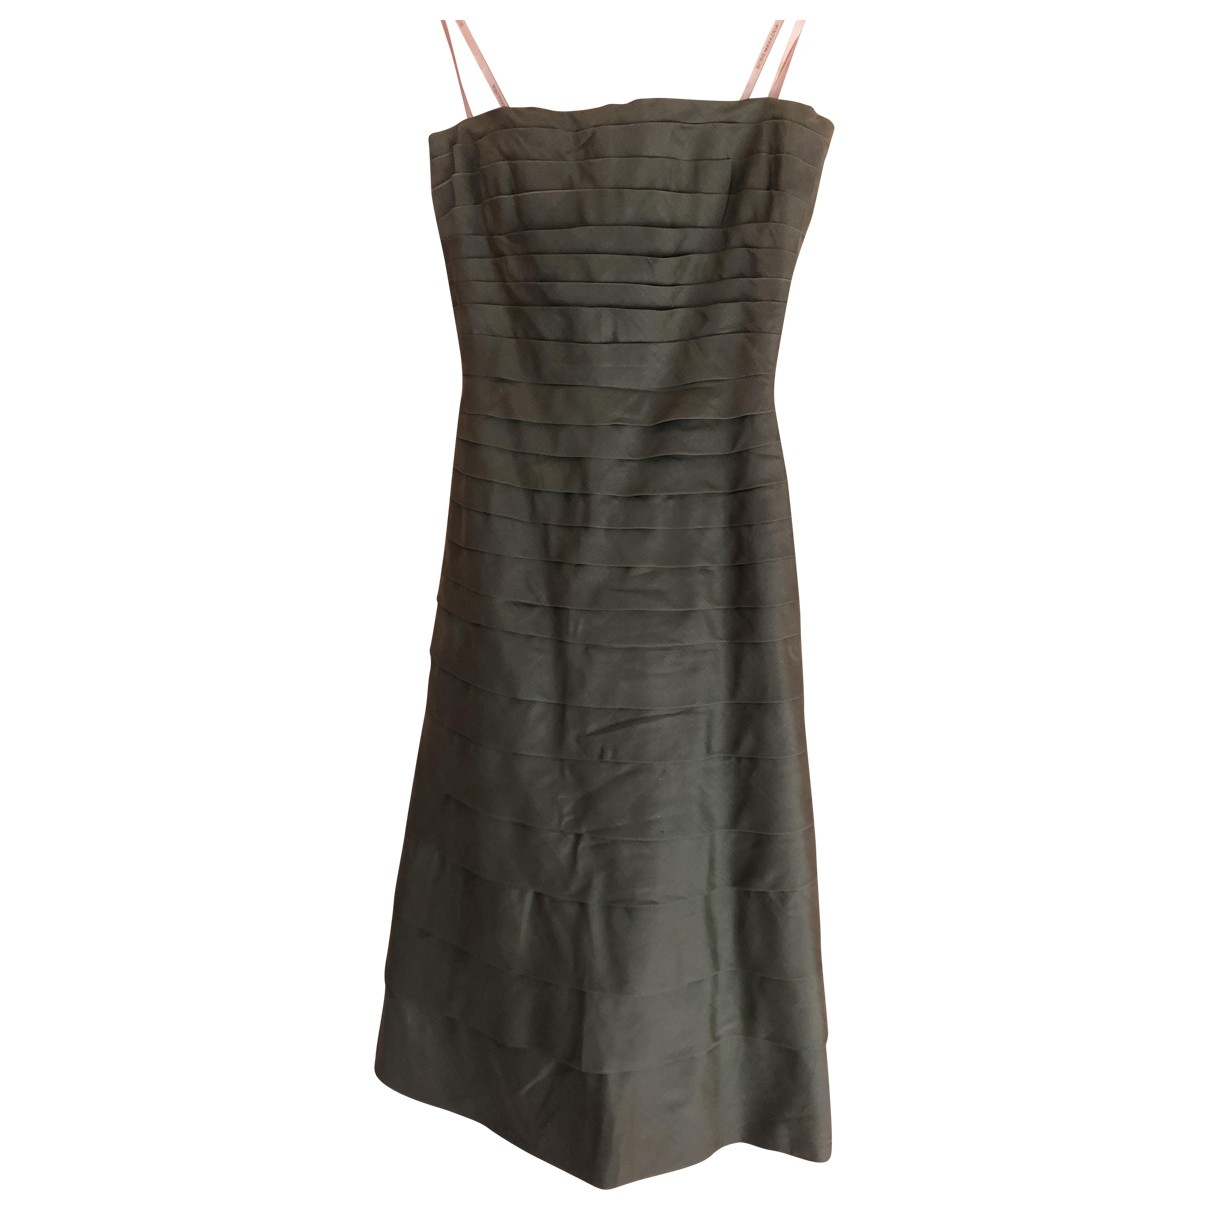 Max Azria \N Green dress for Women 36 FR